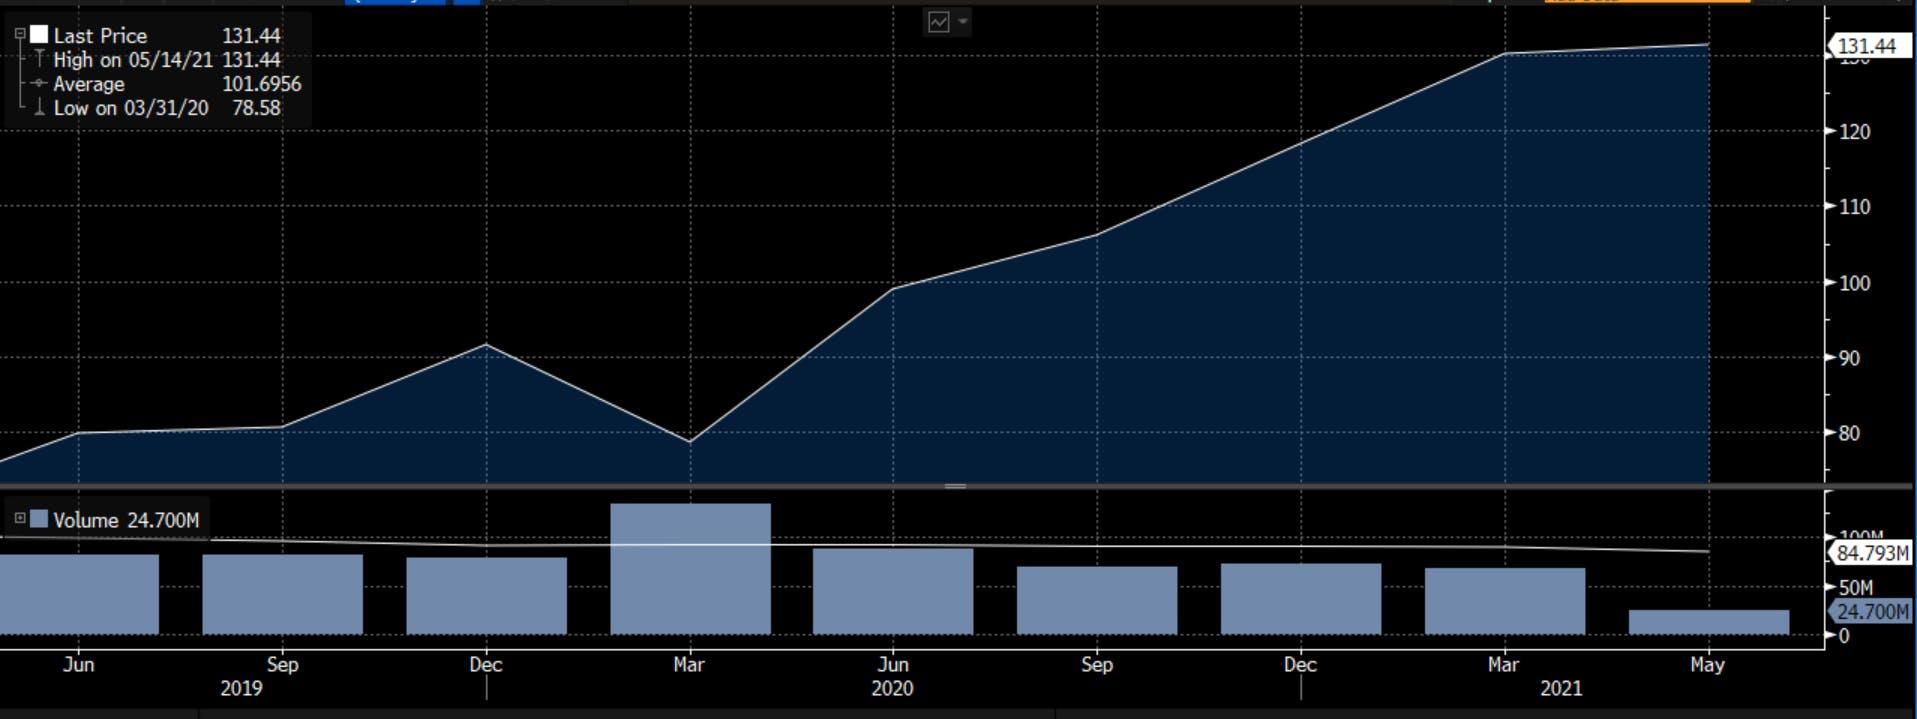 SE's stock price movement, 2019-2021. Source: Bloomberg